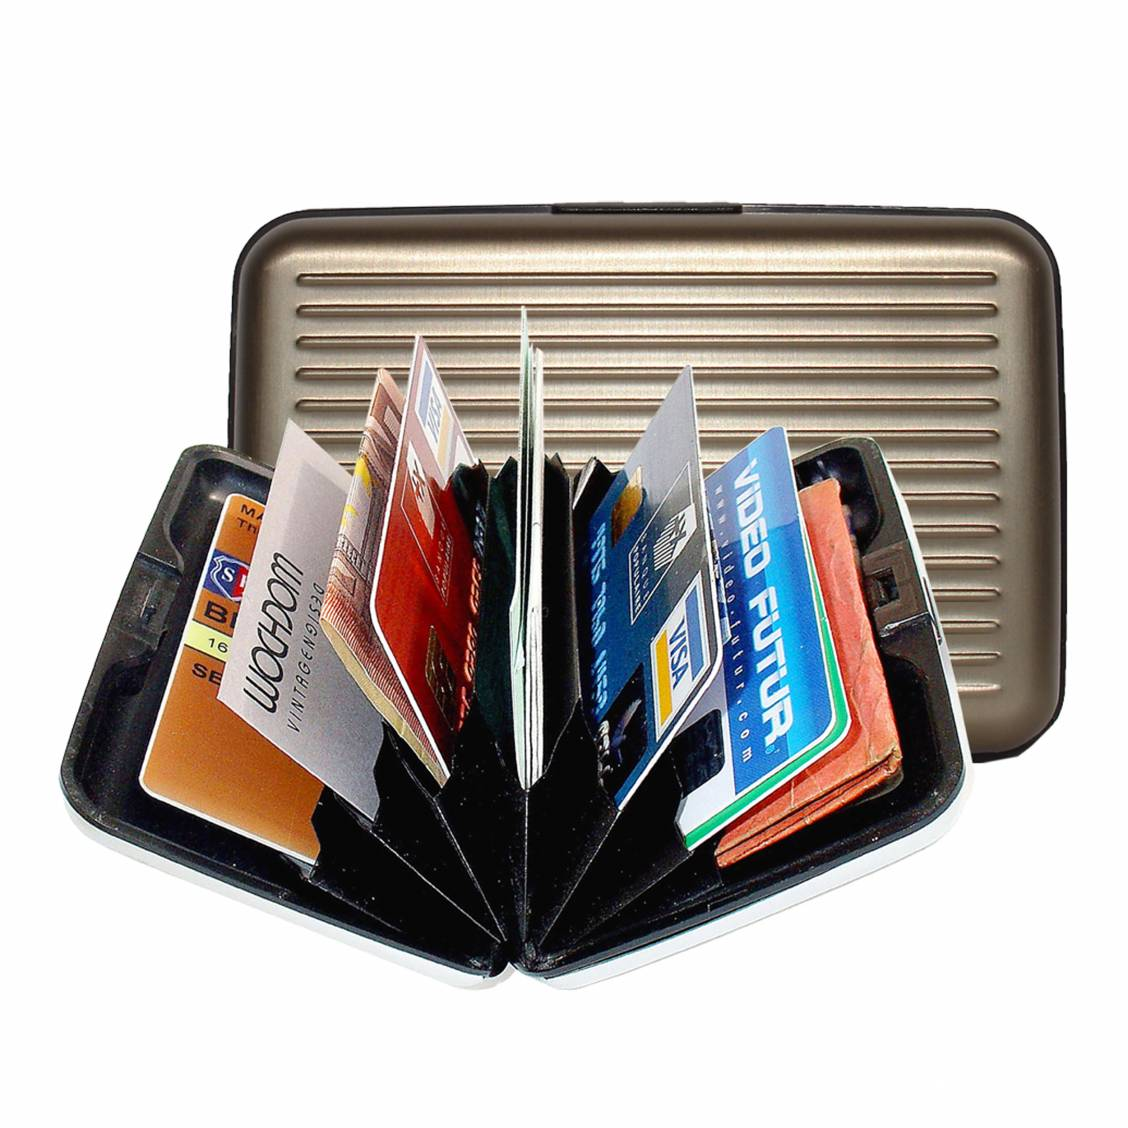 porte-cartes Ögon en aluminium